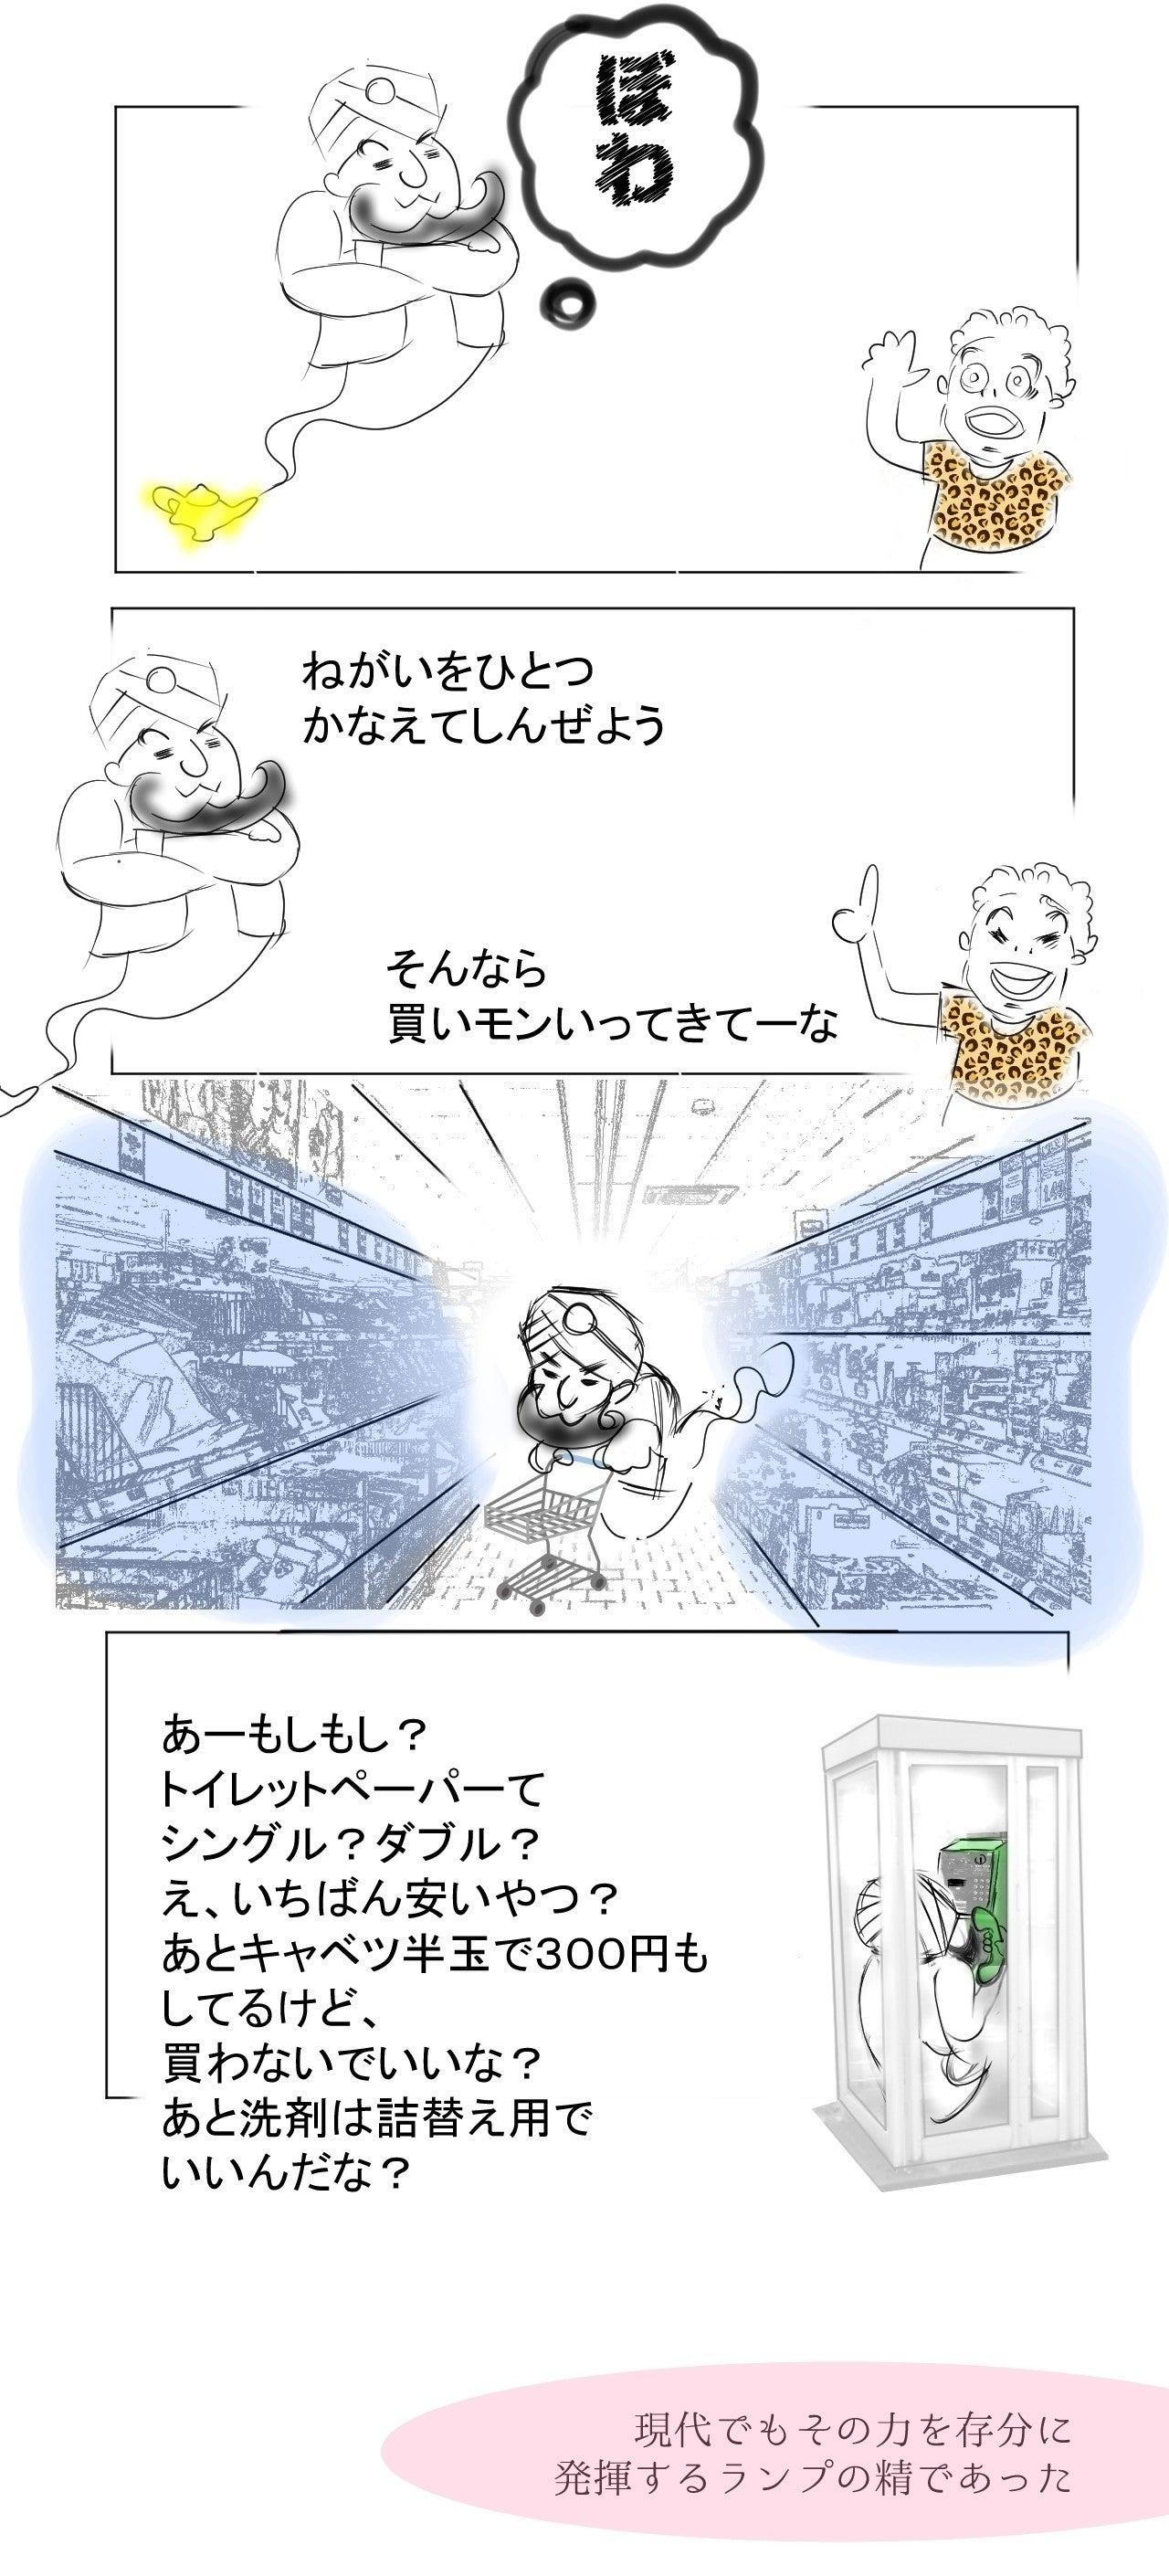 tori_-_コピー